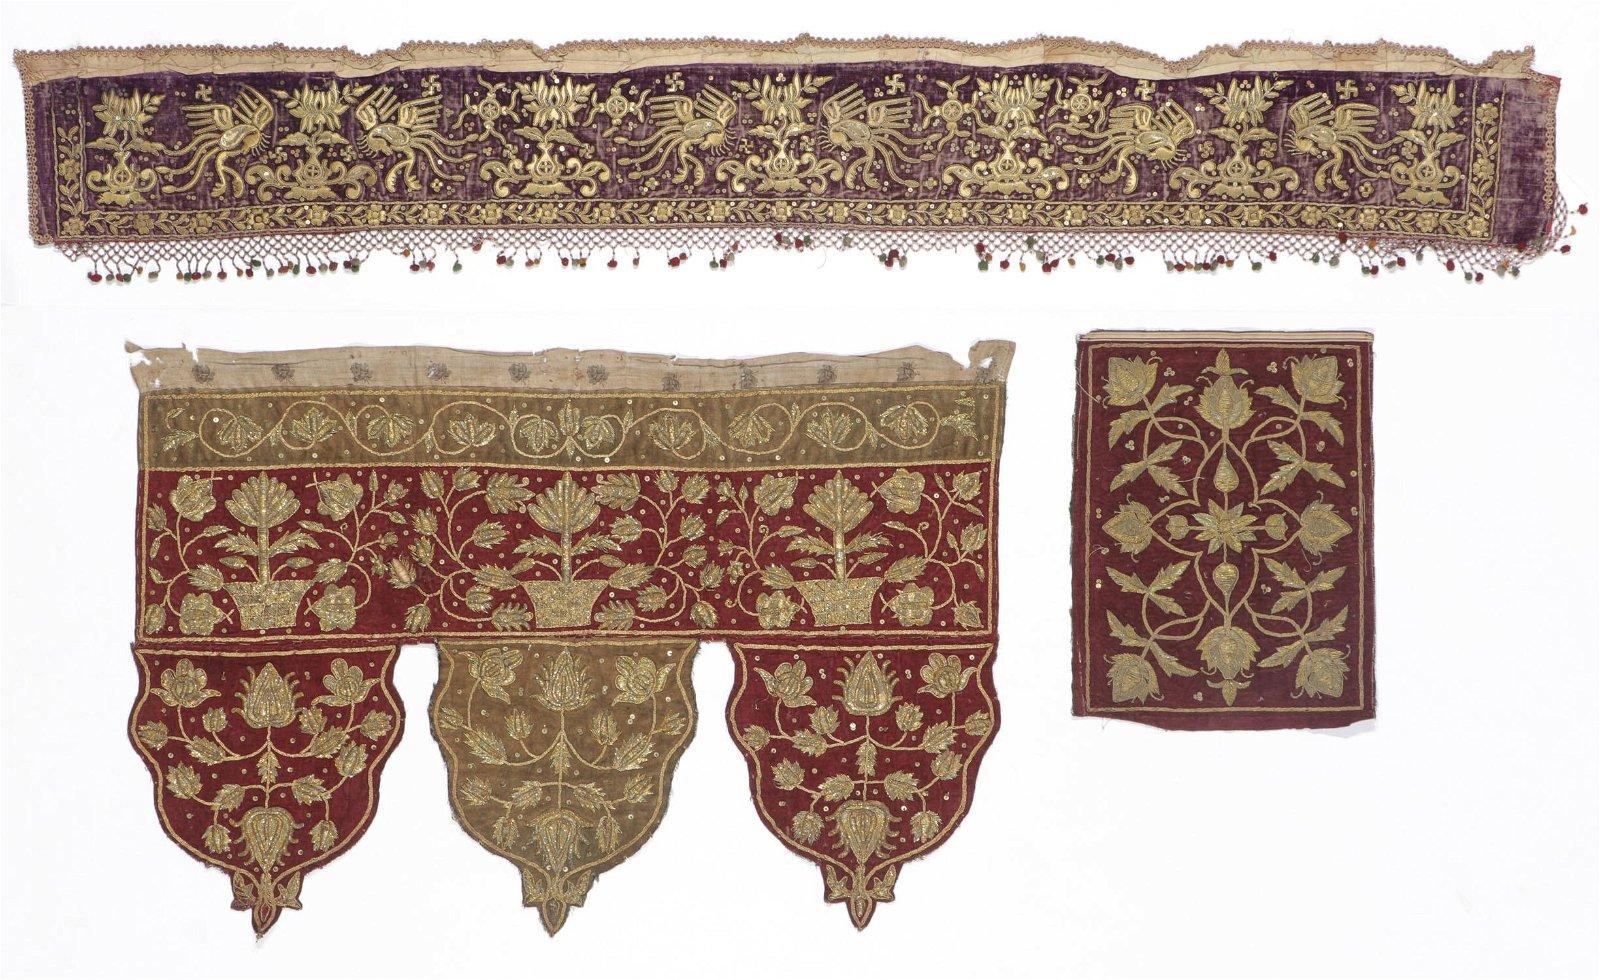 3 Antique Chinese/Sumatran Textiles